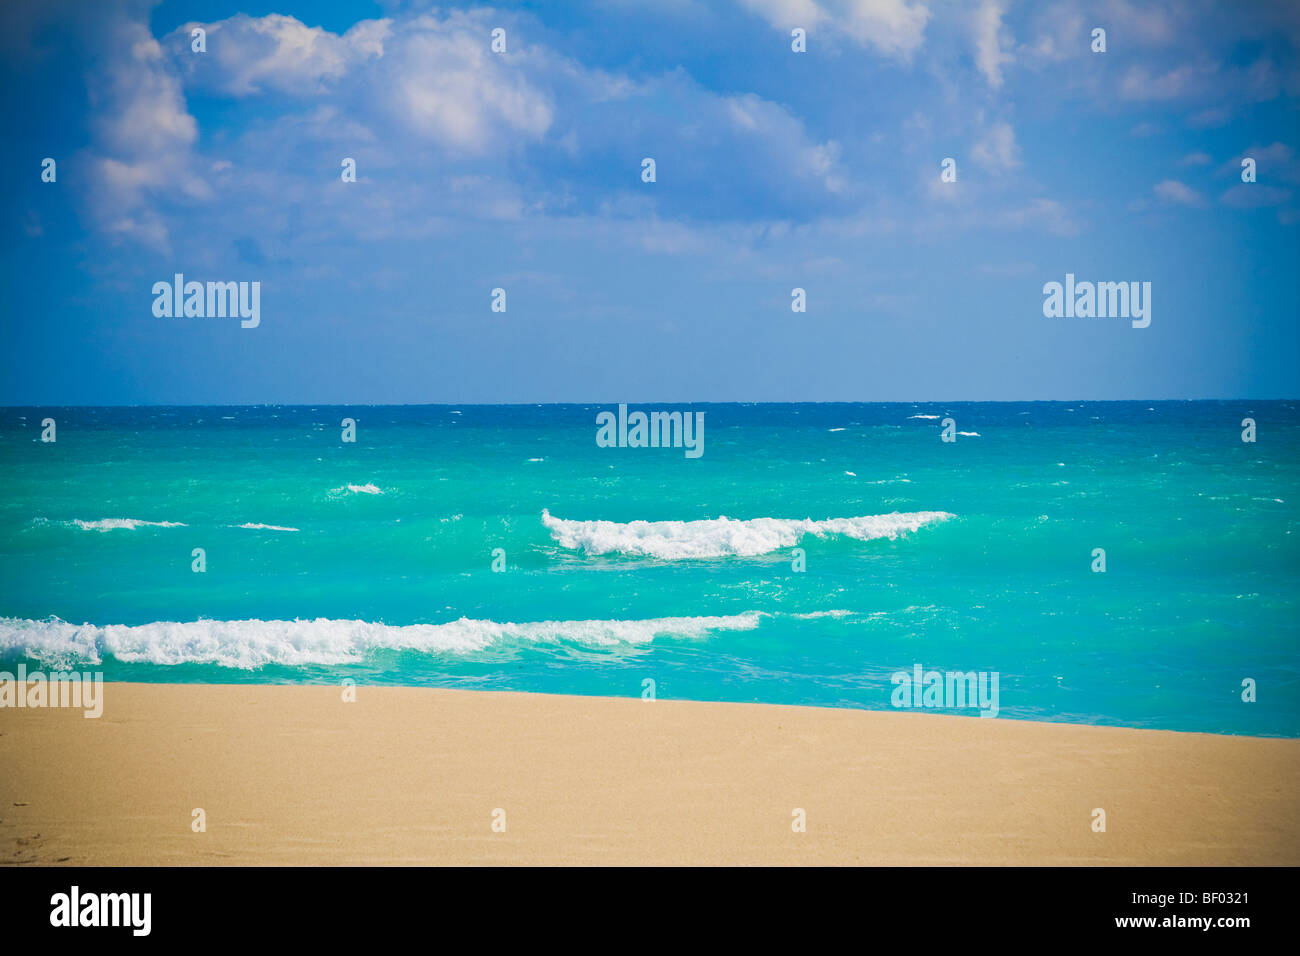 Stunning blue ocean at Miami beach. South beach, Miami, Florida, USA. - Stock Image